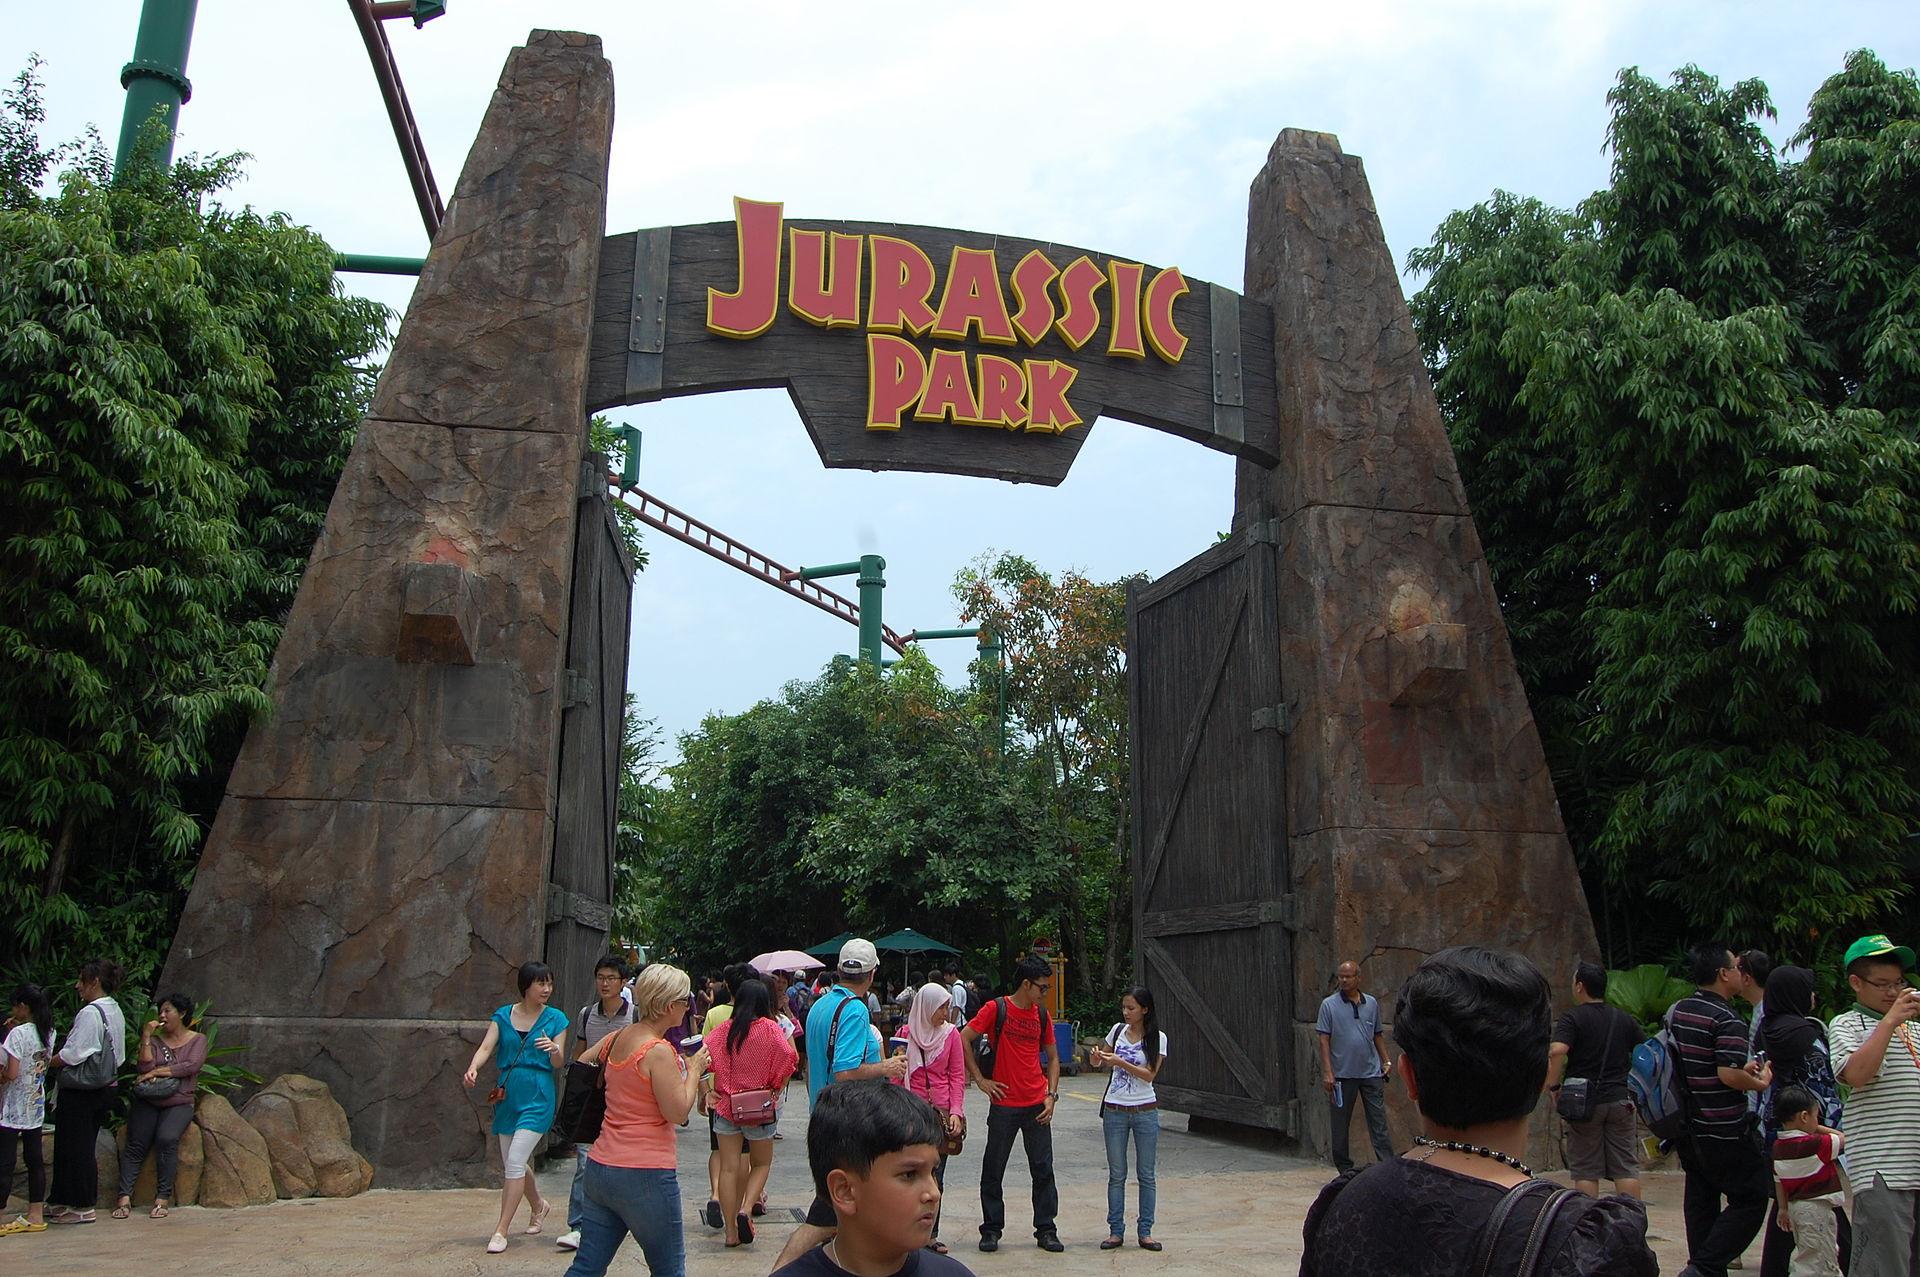 jurassic park franchise wikipedia